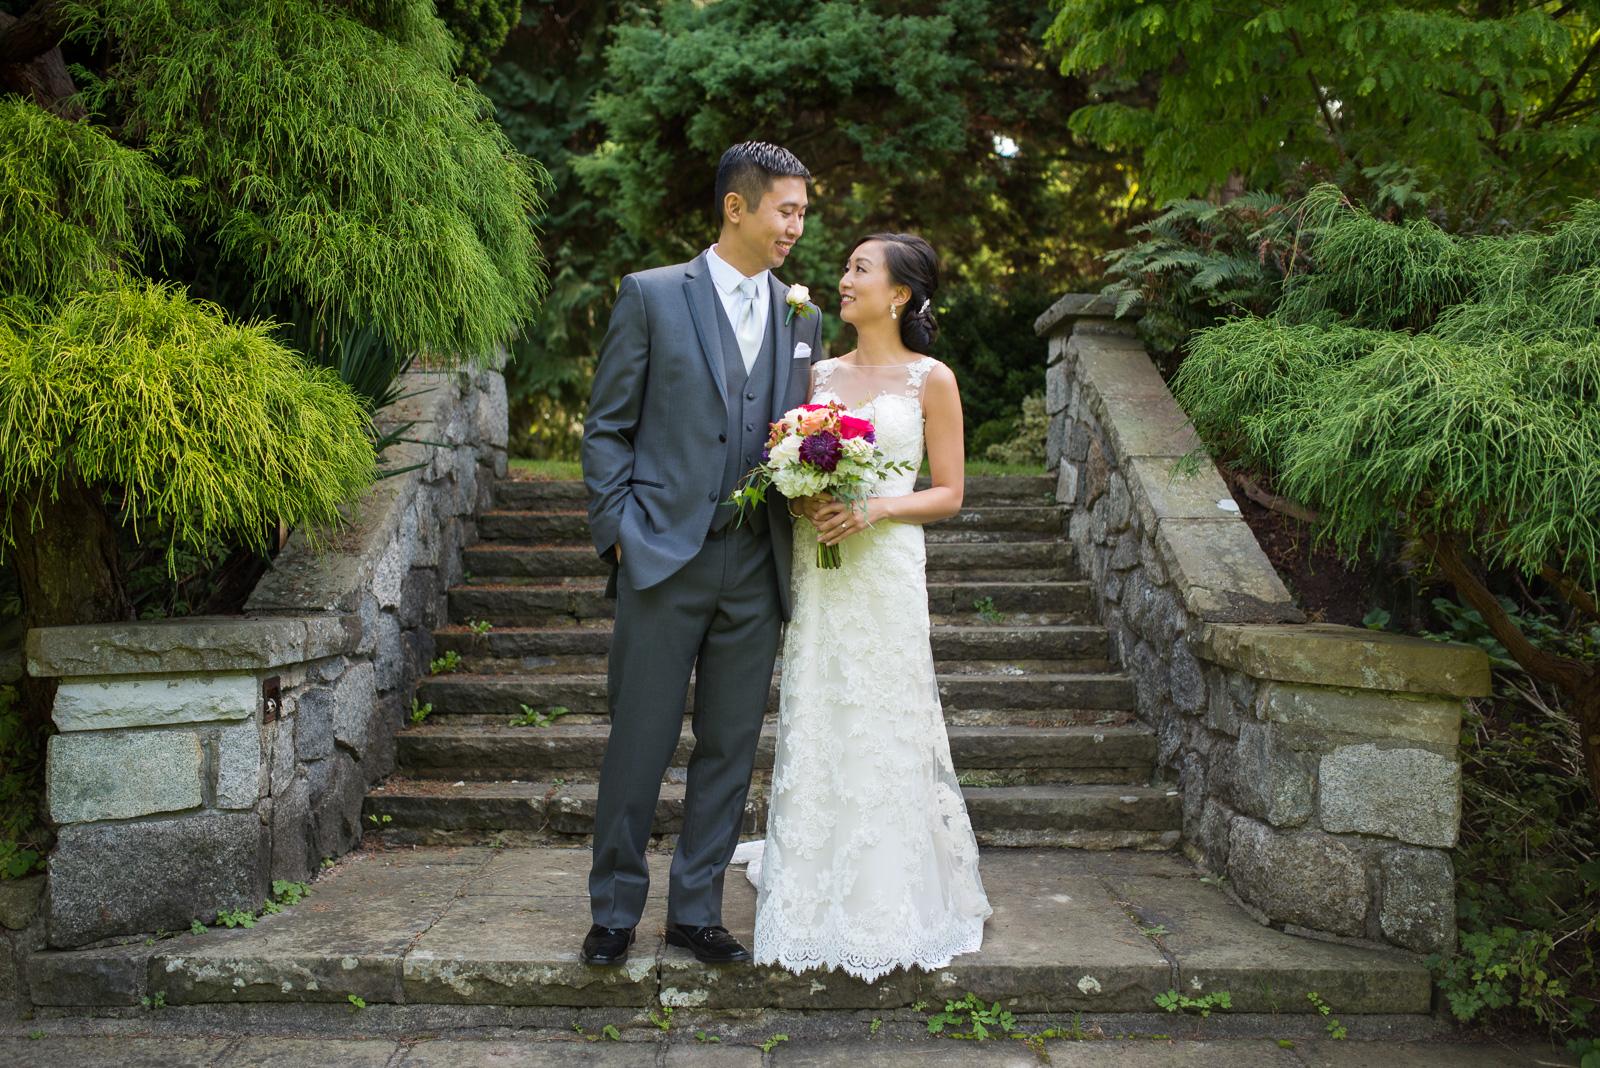 victoria-wedding-photographers-cecil-green-park-house-wedding-14.jpg